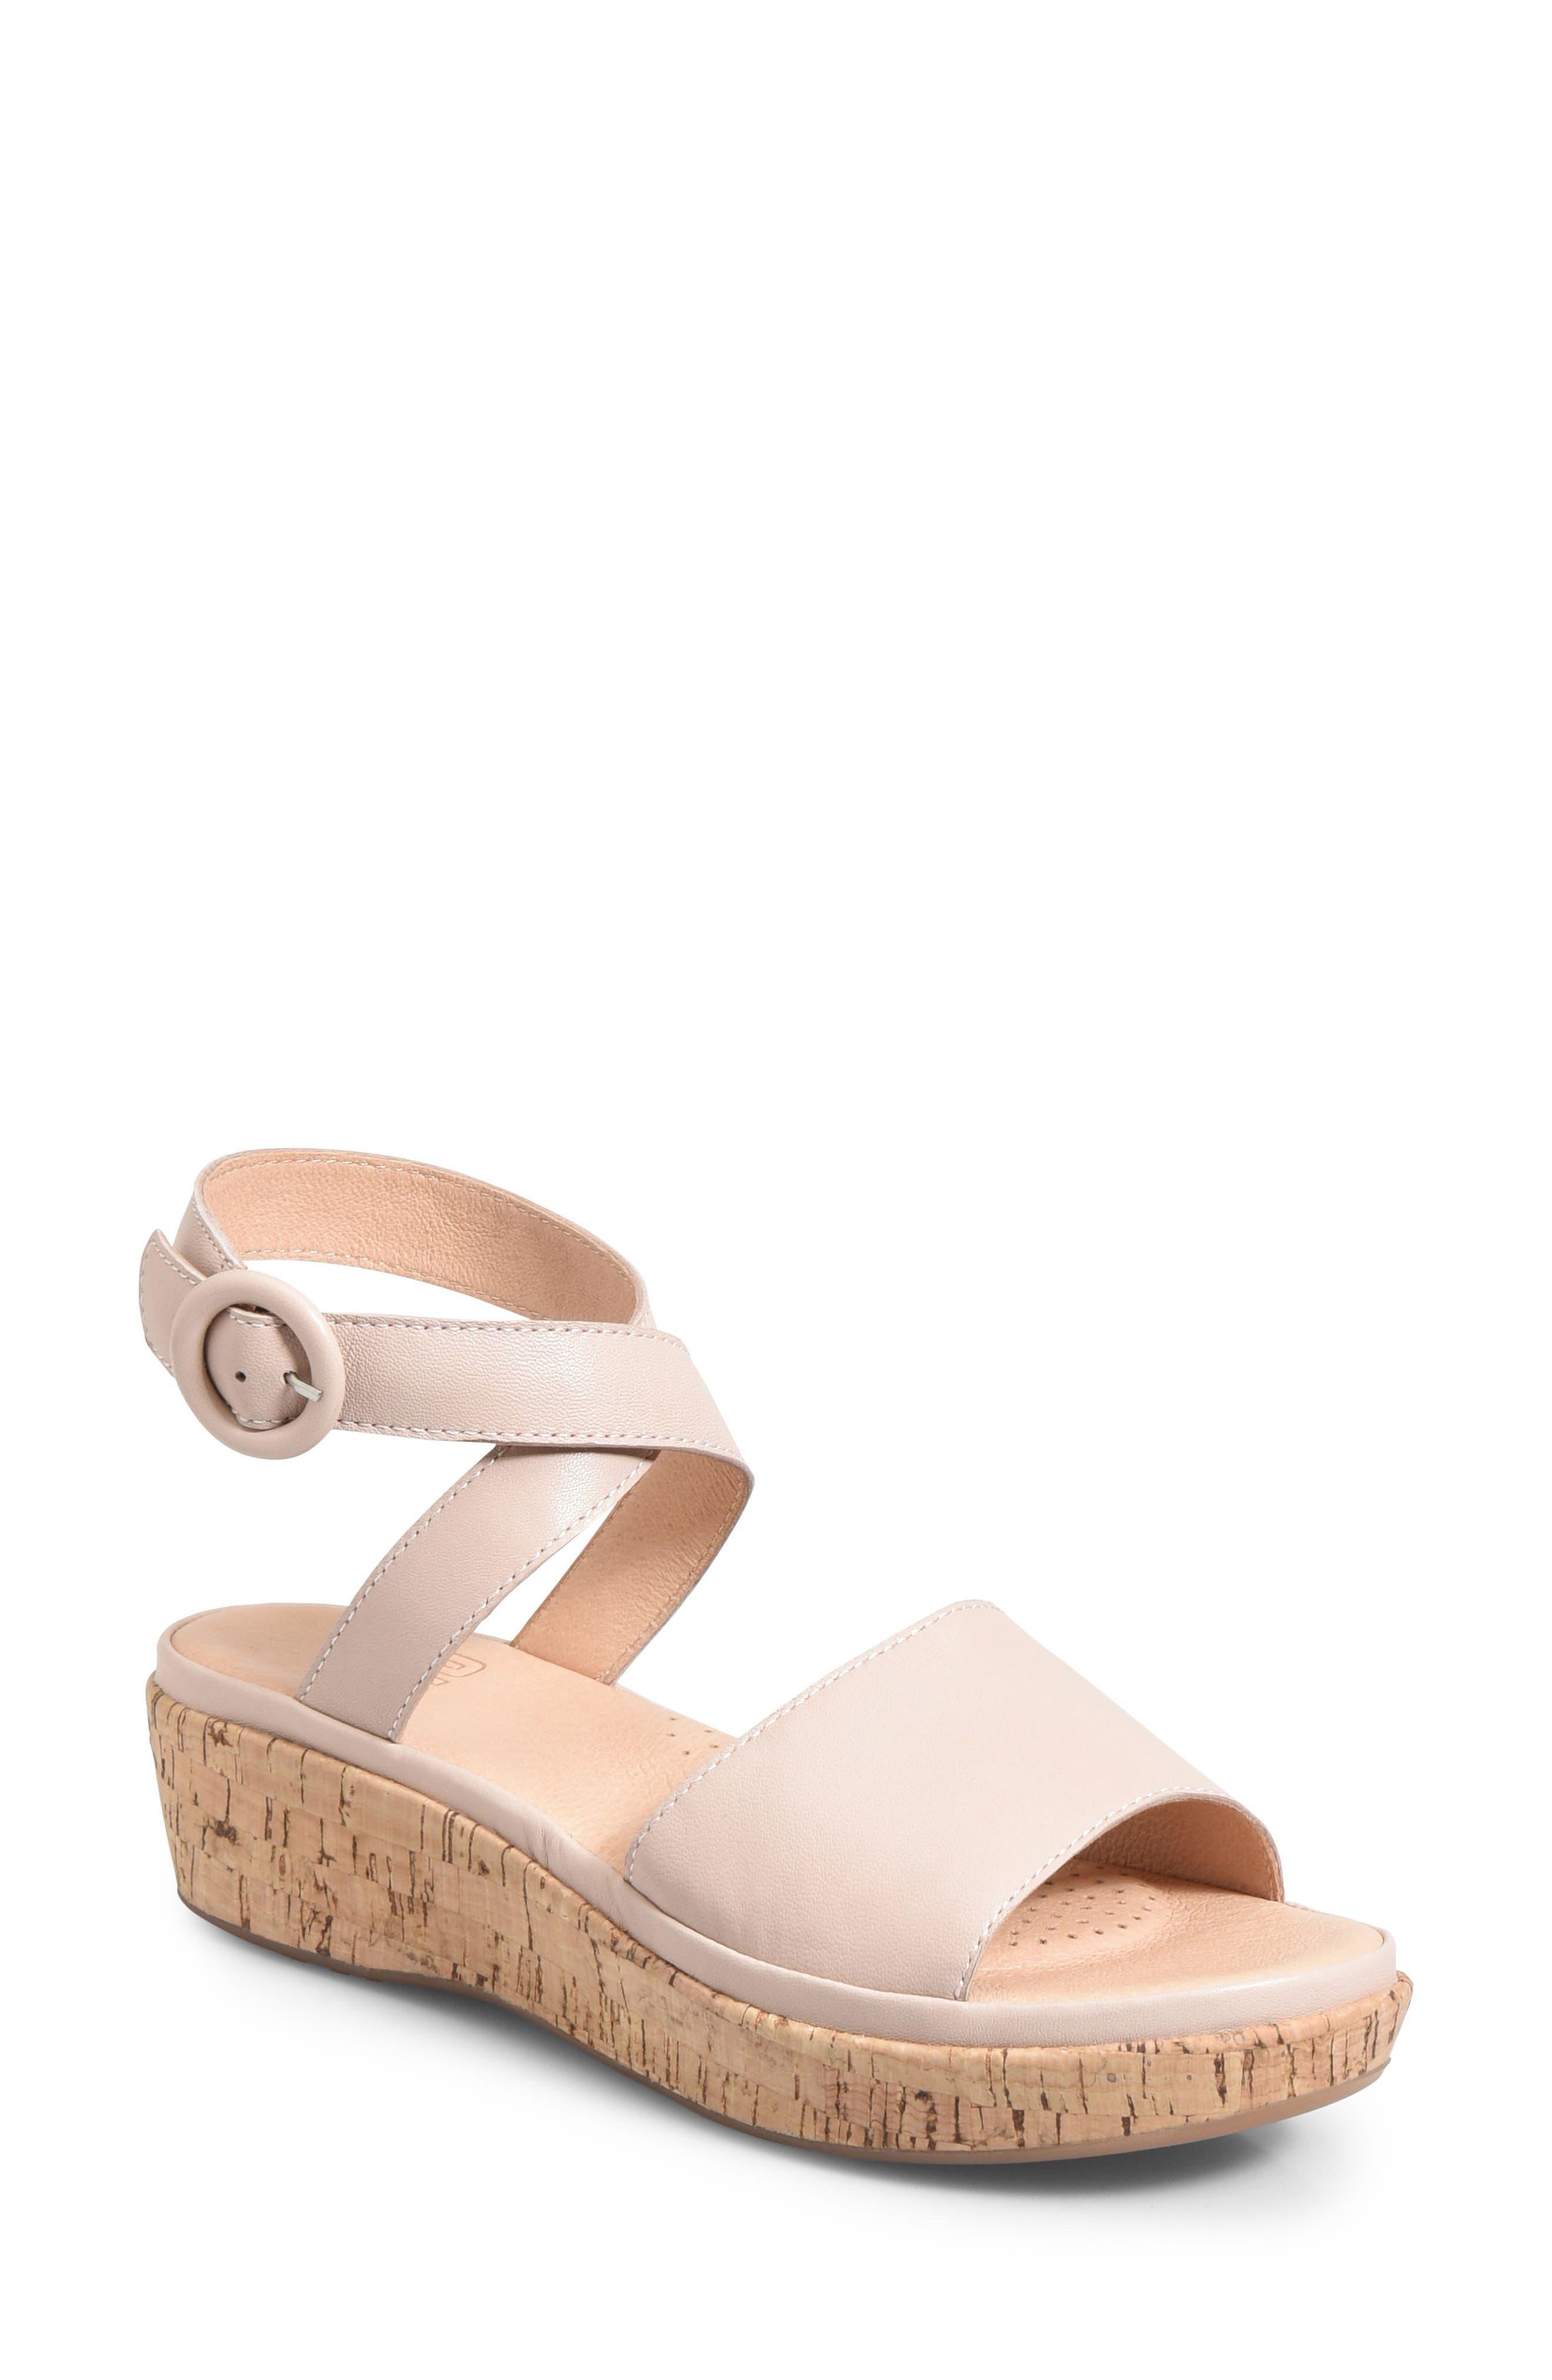 Ono Dreamy Platform Wedge Sandal, Pink